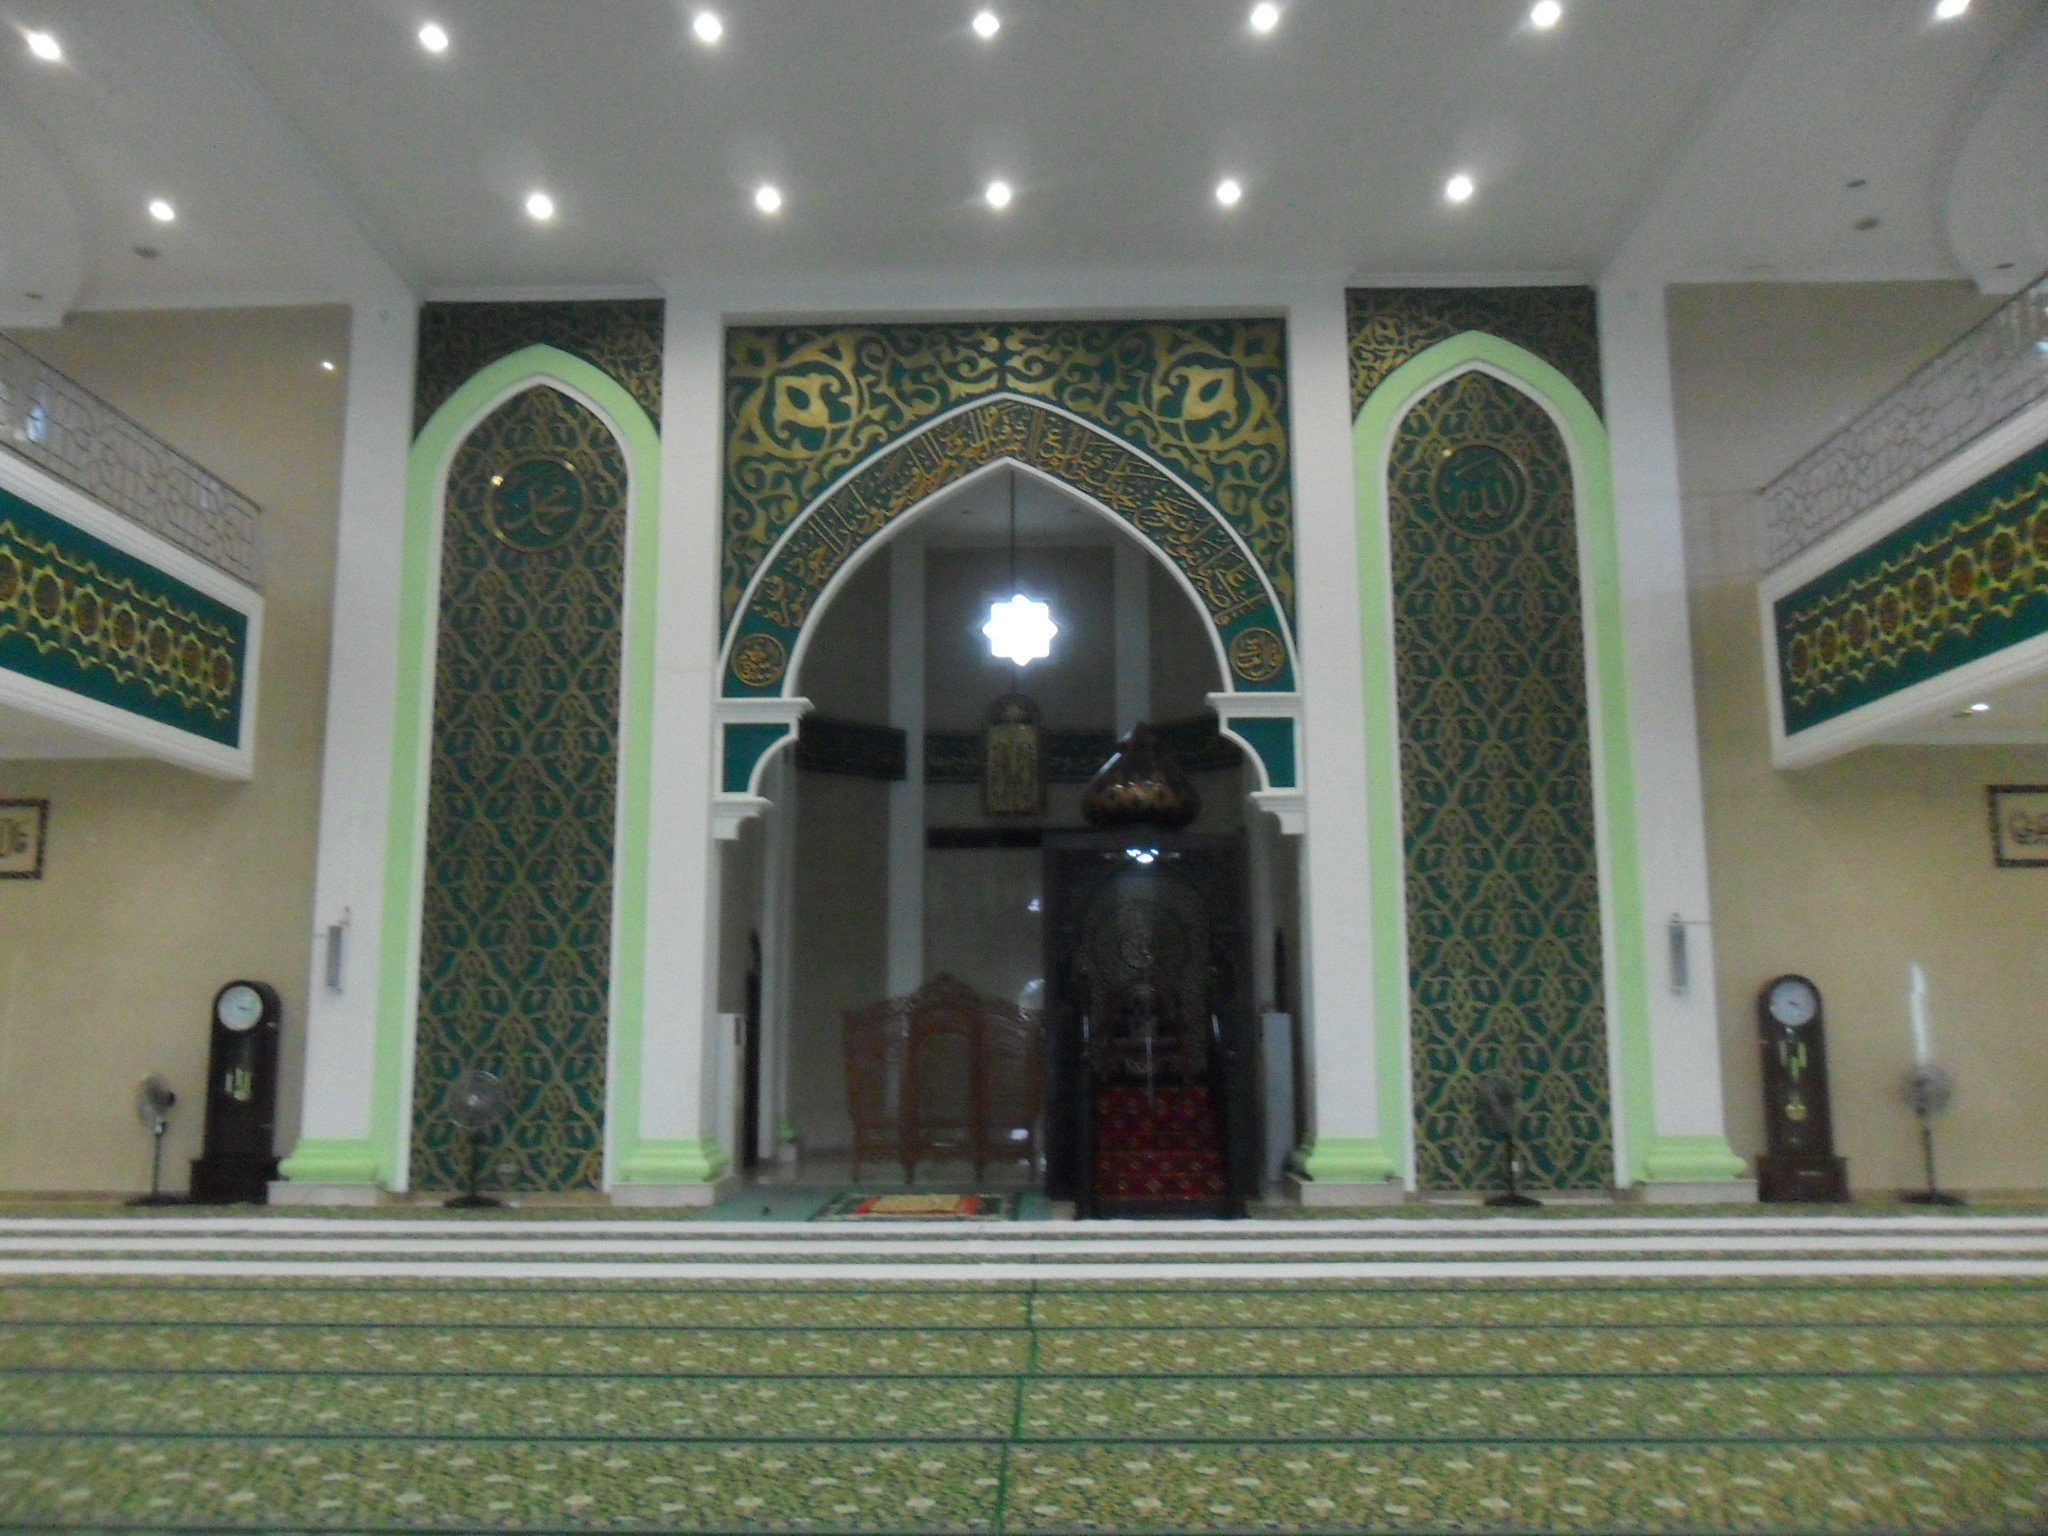 FileInterior of Nurul Falah Great Mosque Paserjpg